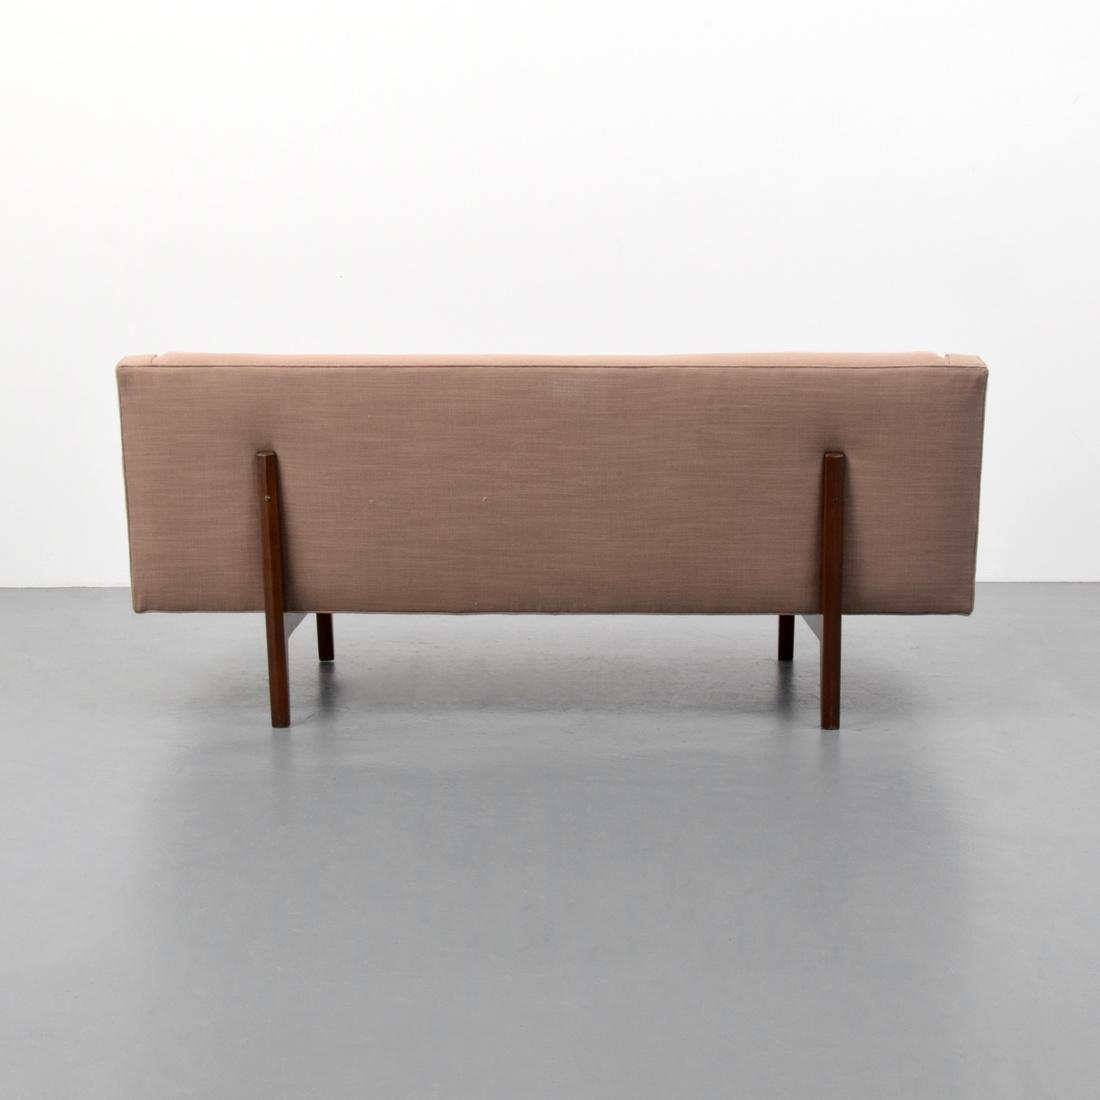 Edward Wormley BRACKET BACK Sofa - 2